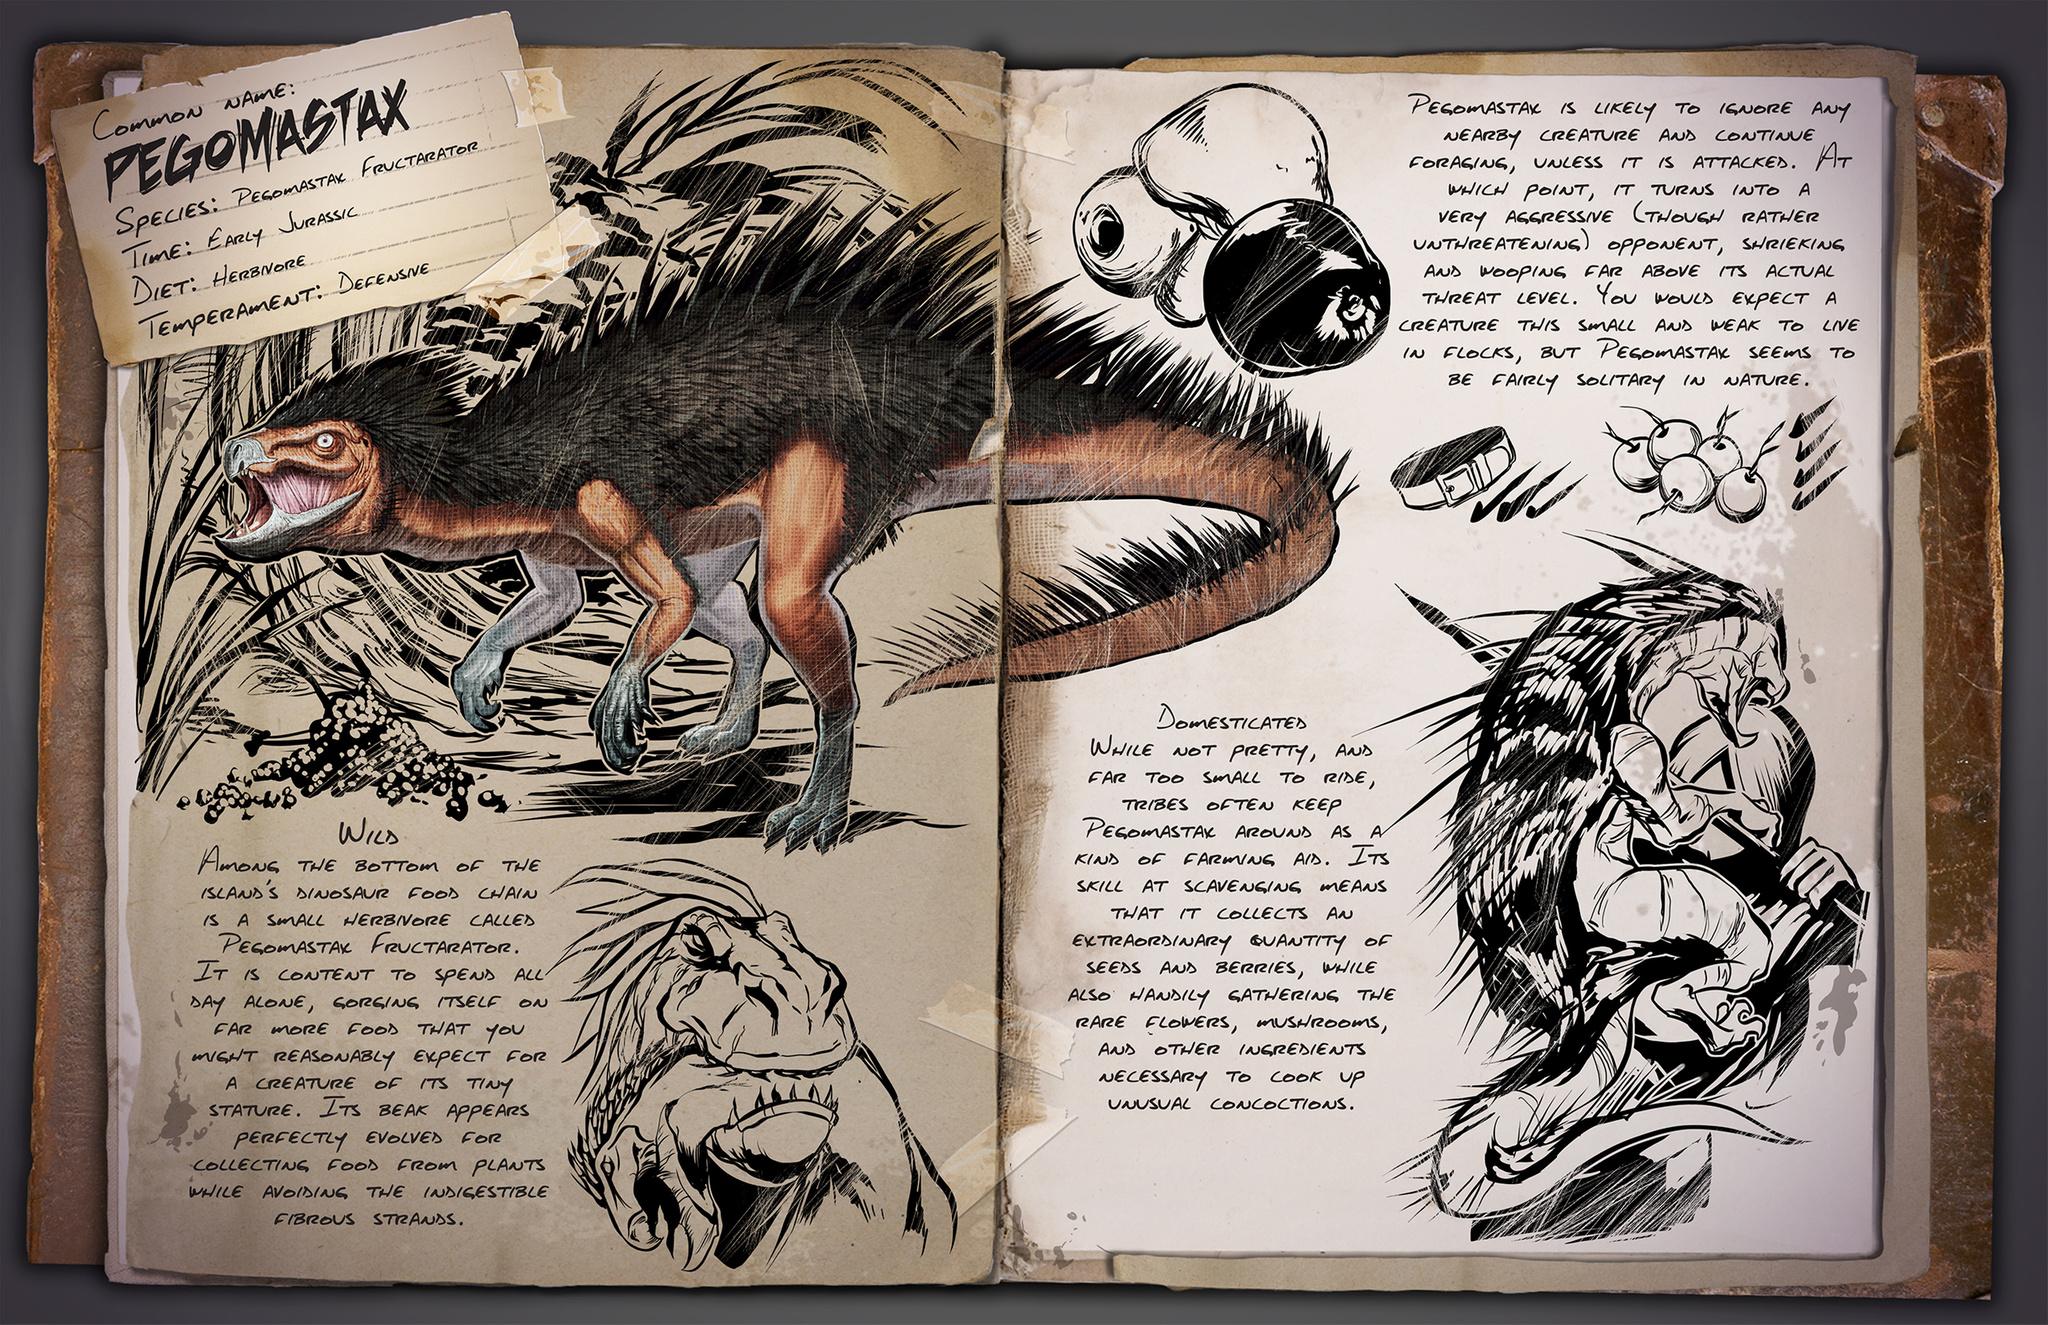 Dino Dossier Pegomastax